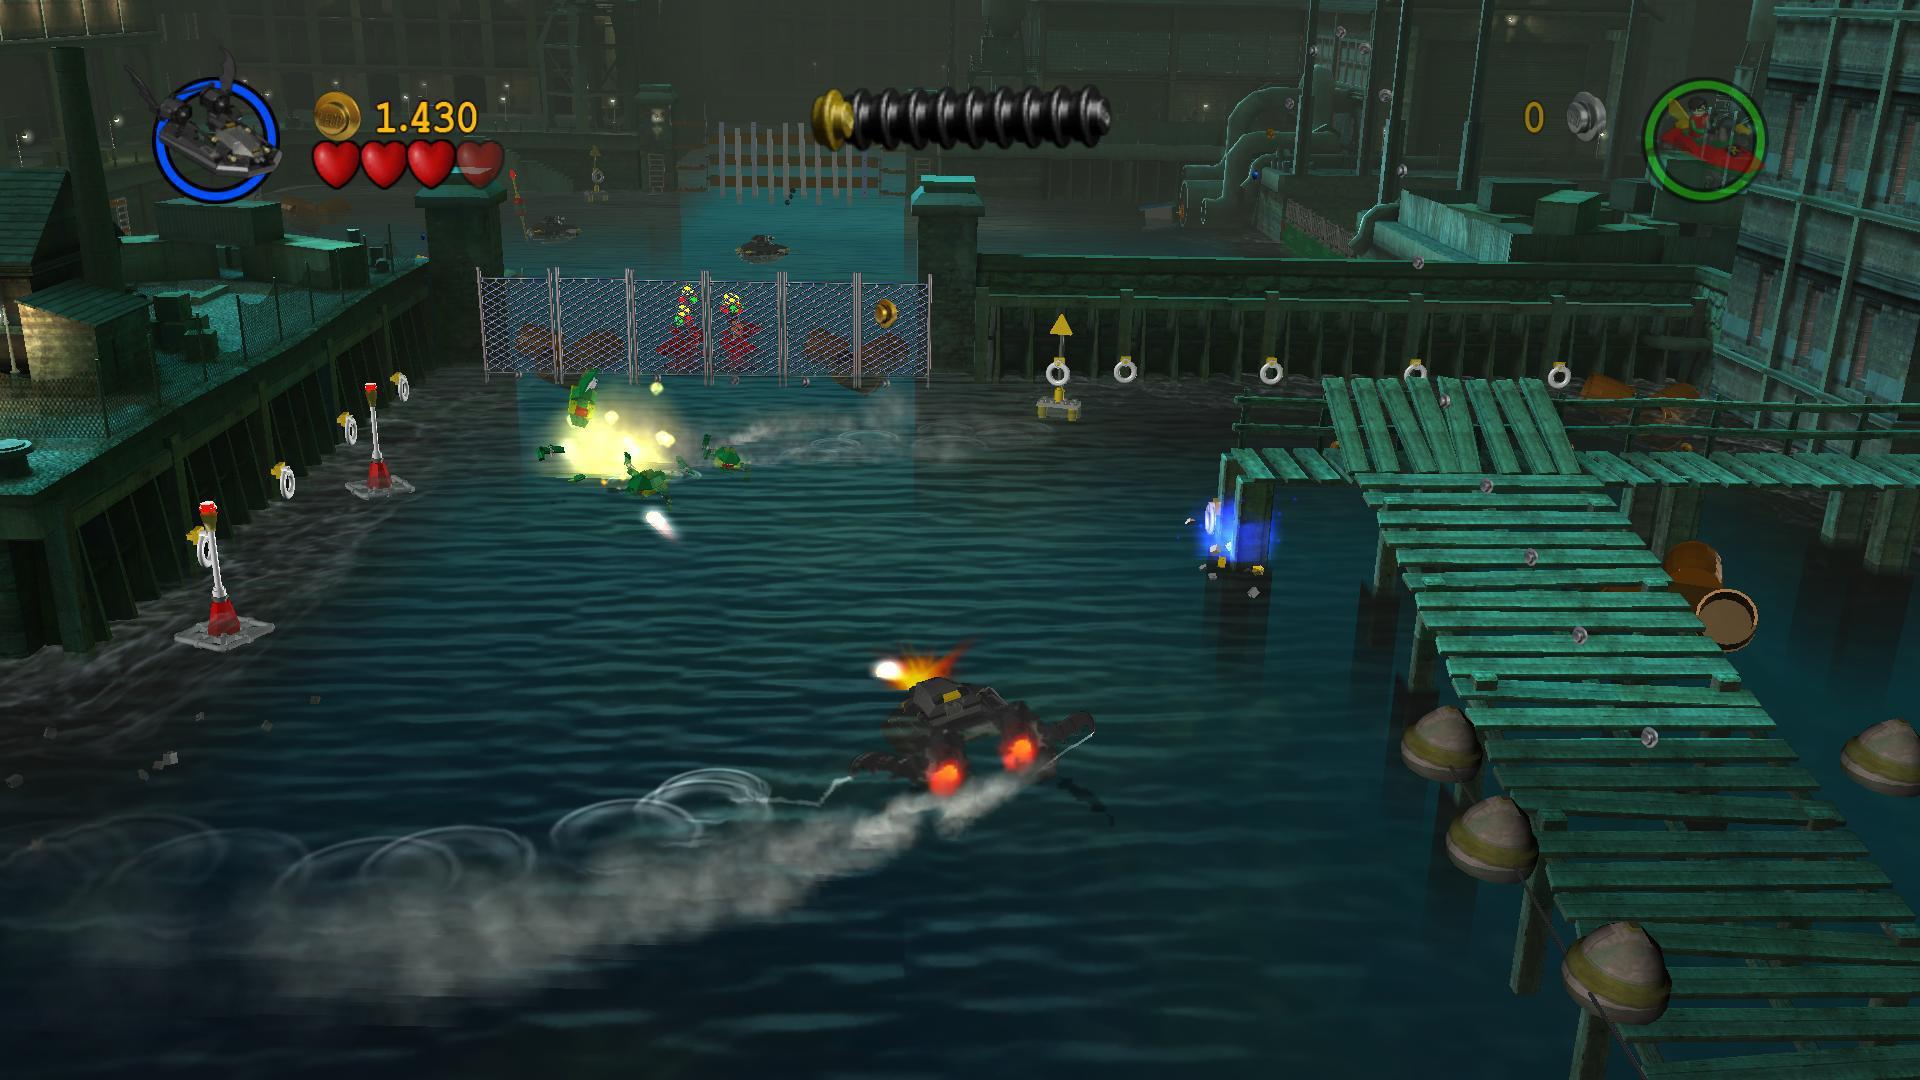 LEGO Batman: The Videogame Screenshot 7